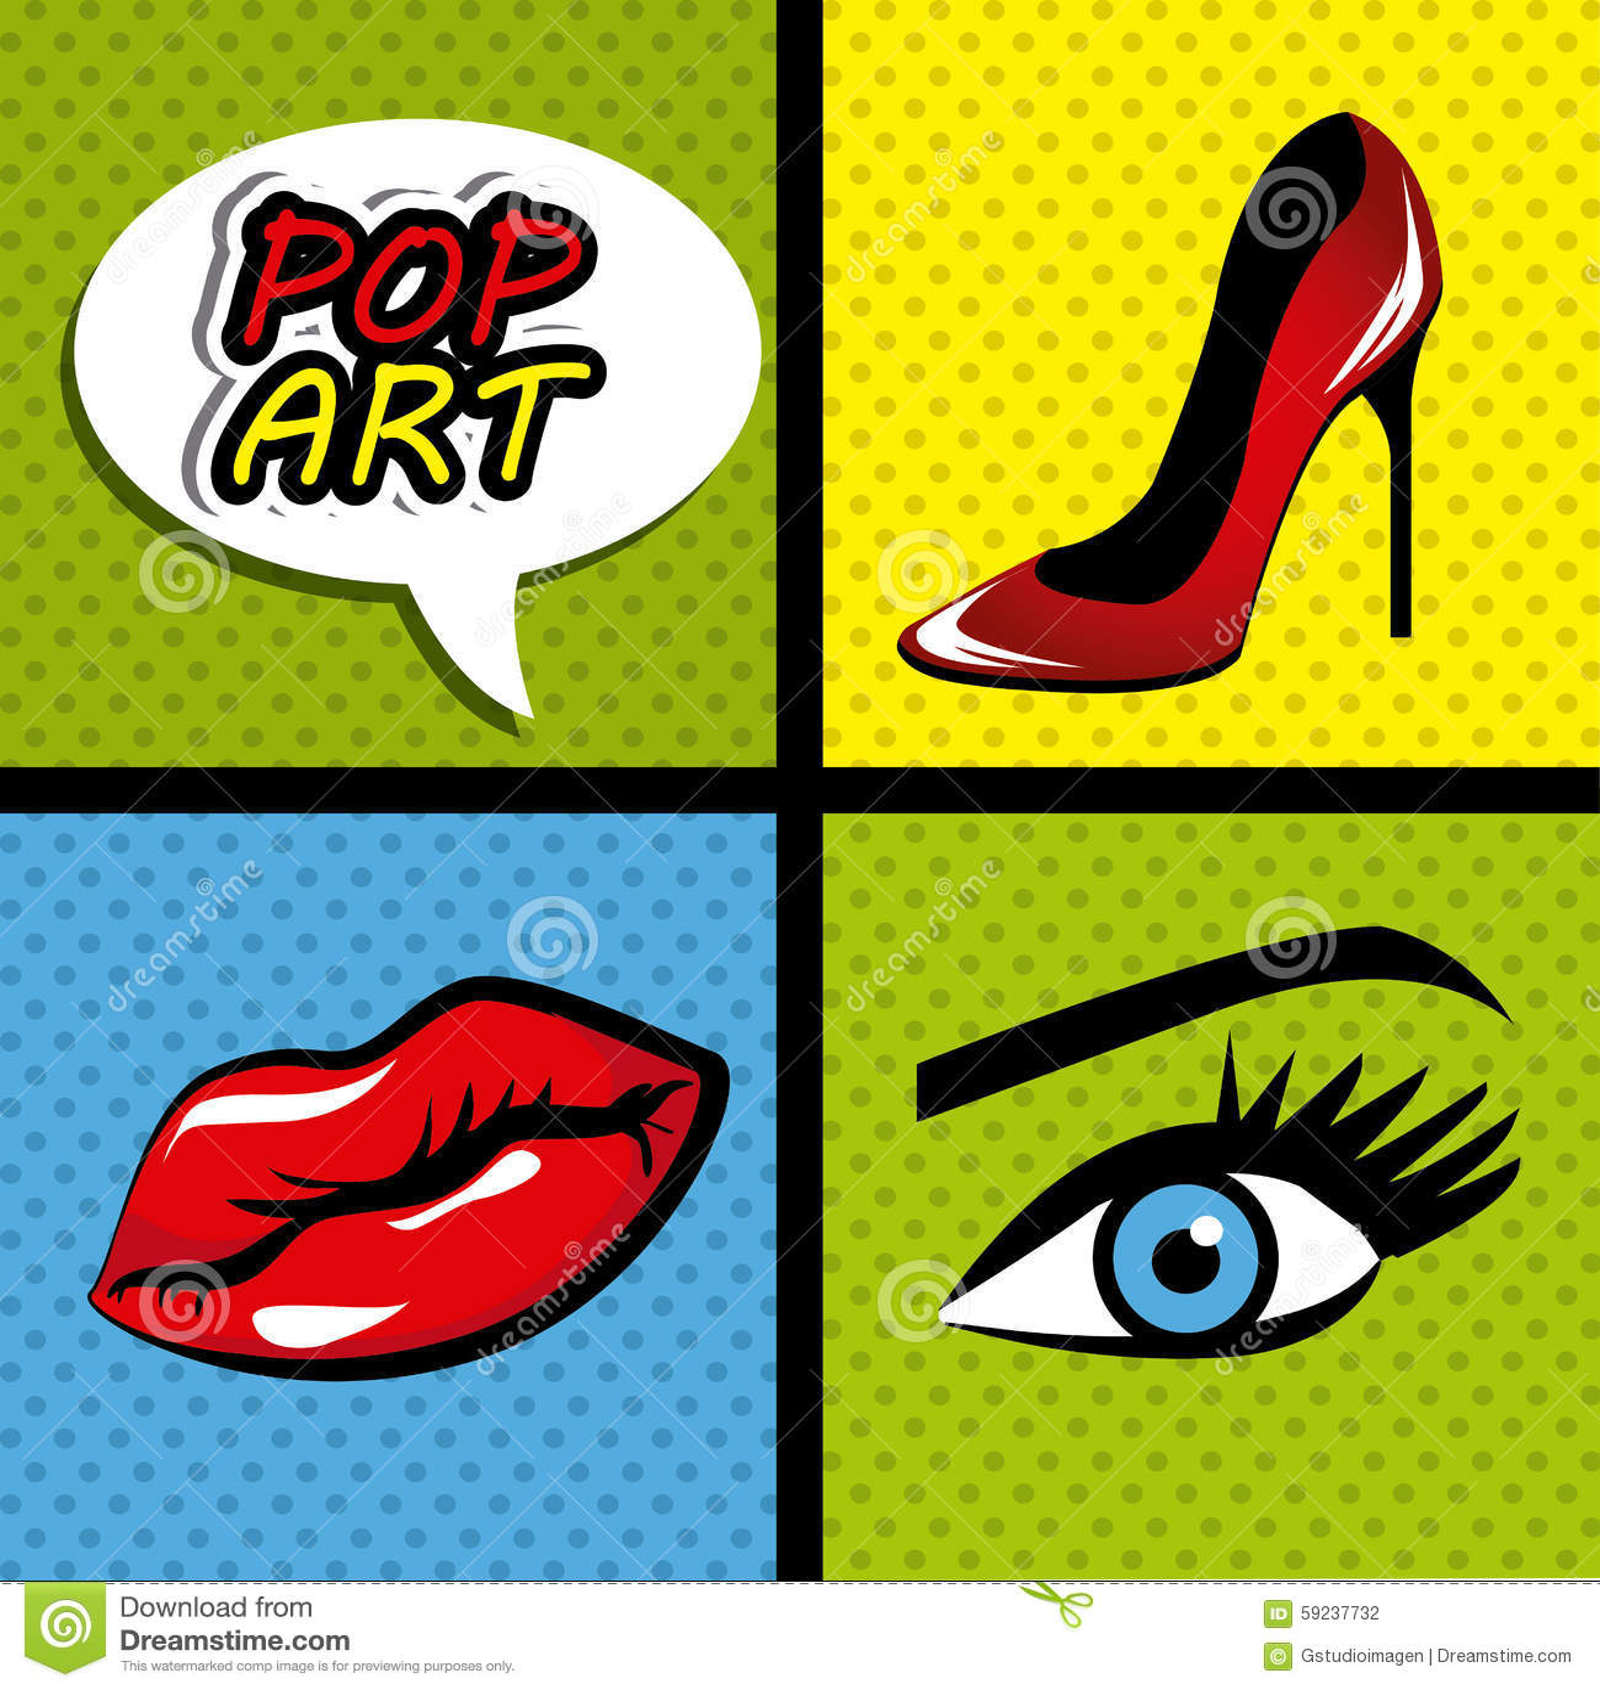 Pop Art Cartoon Graphics Stock Illustration Illustration Of Human